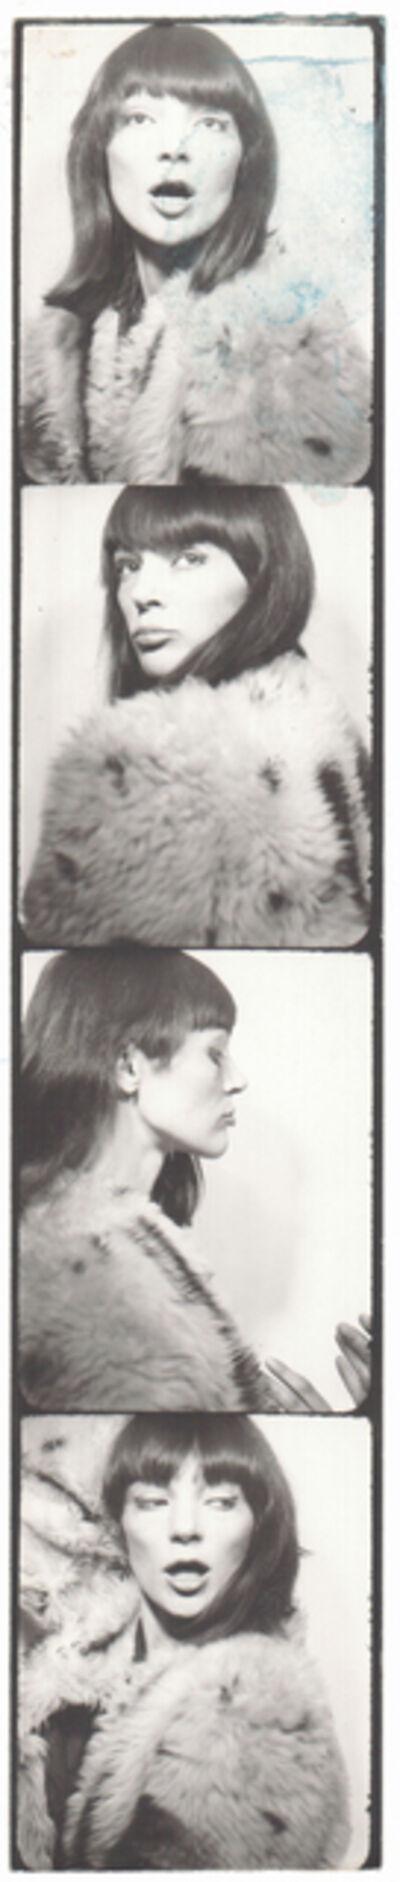 Andy Warhol, 'Ivy Nicholson's Photobooth', 1964-1967